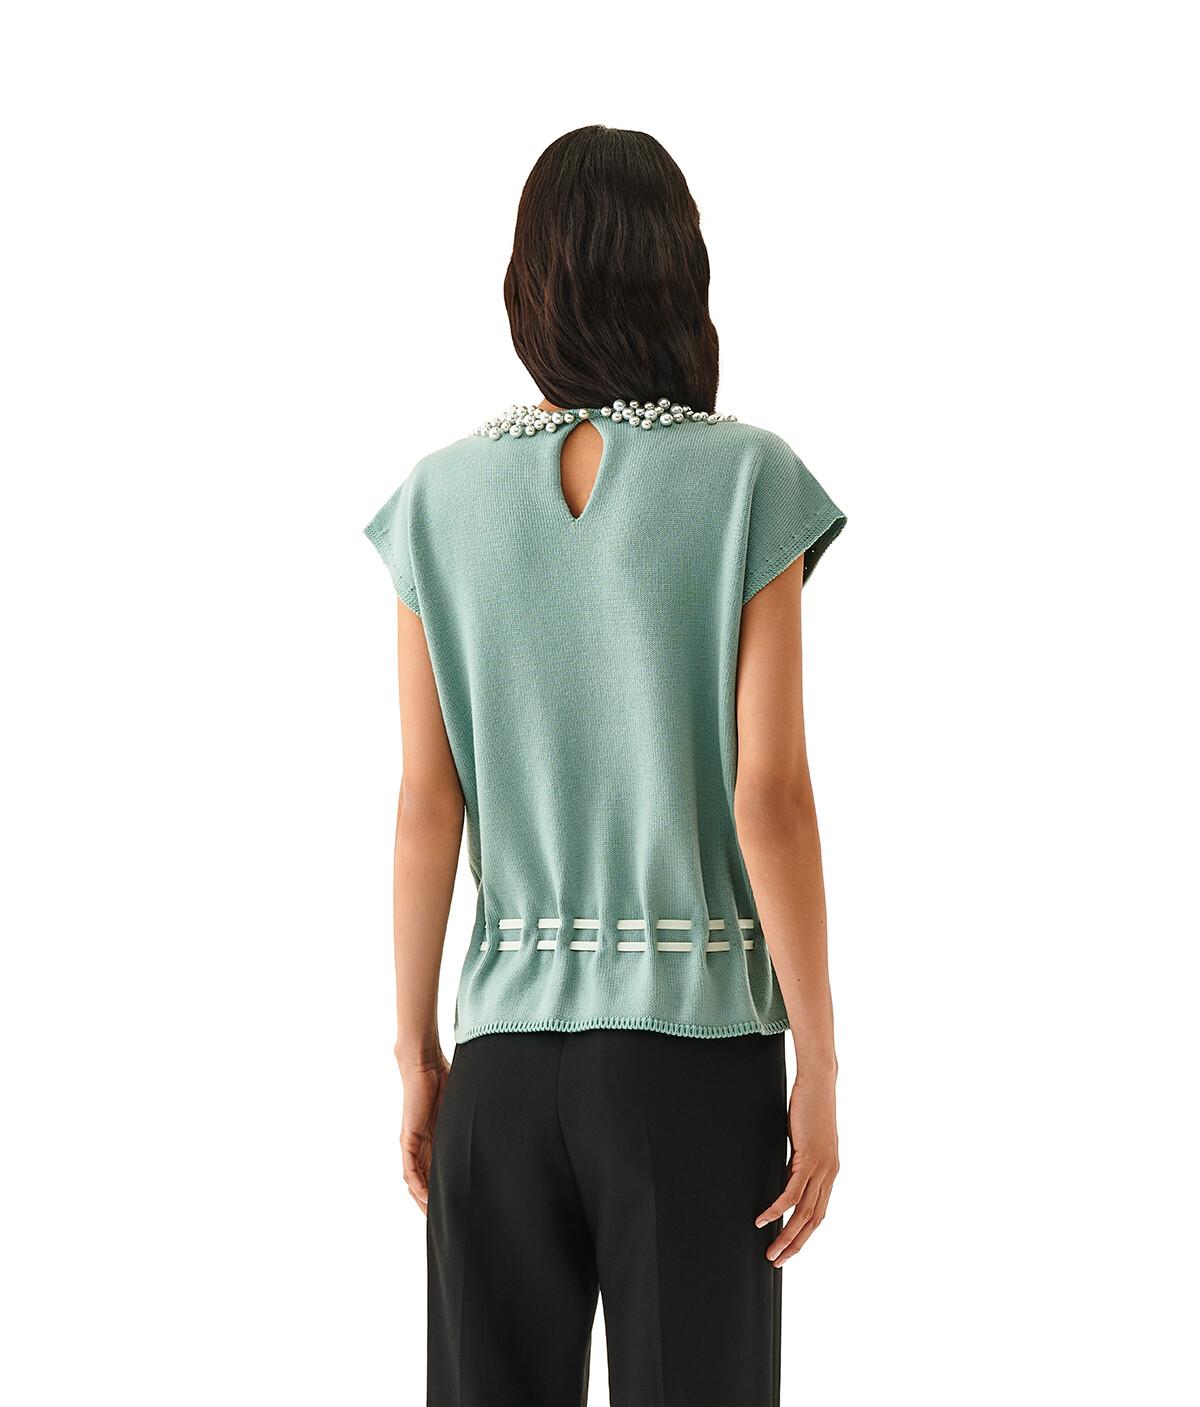 LOEWE Sleeveless Sweater Pearls Verde Agua front